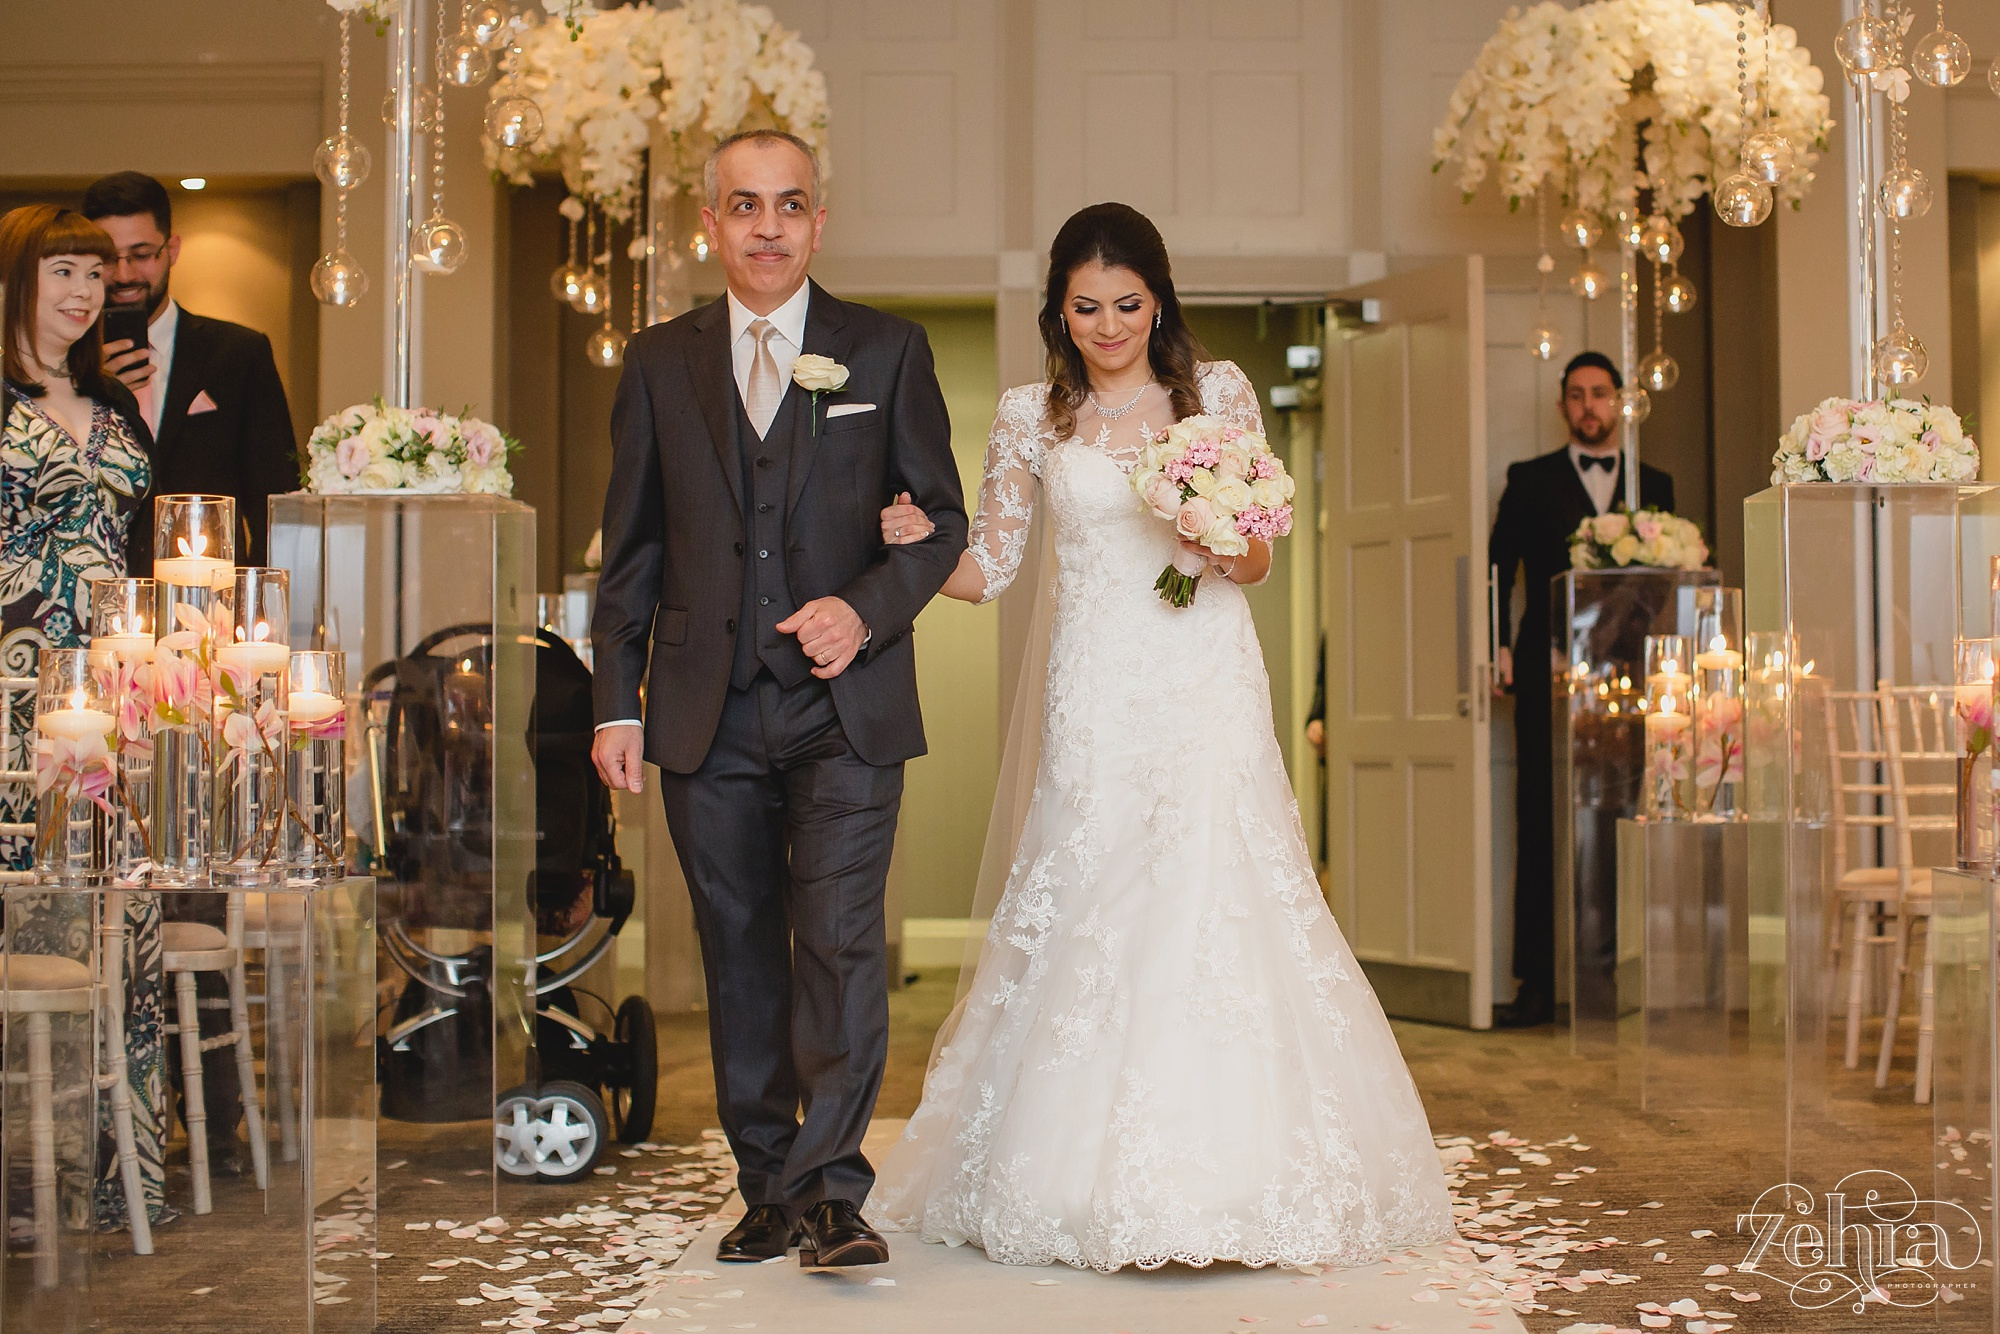 zehra photographer mere cheshire wedding_0010.jpg